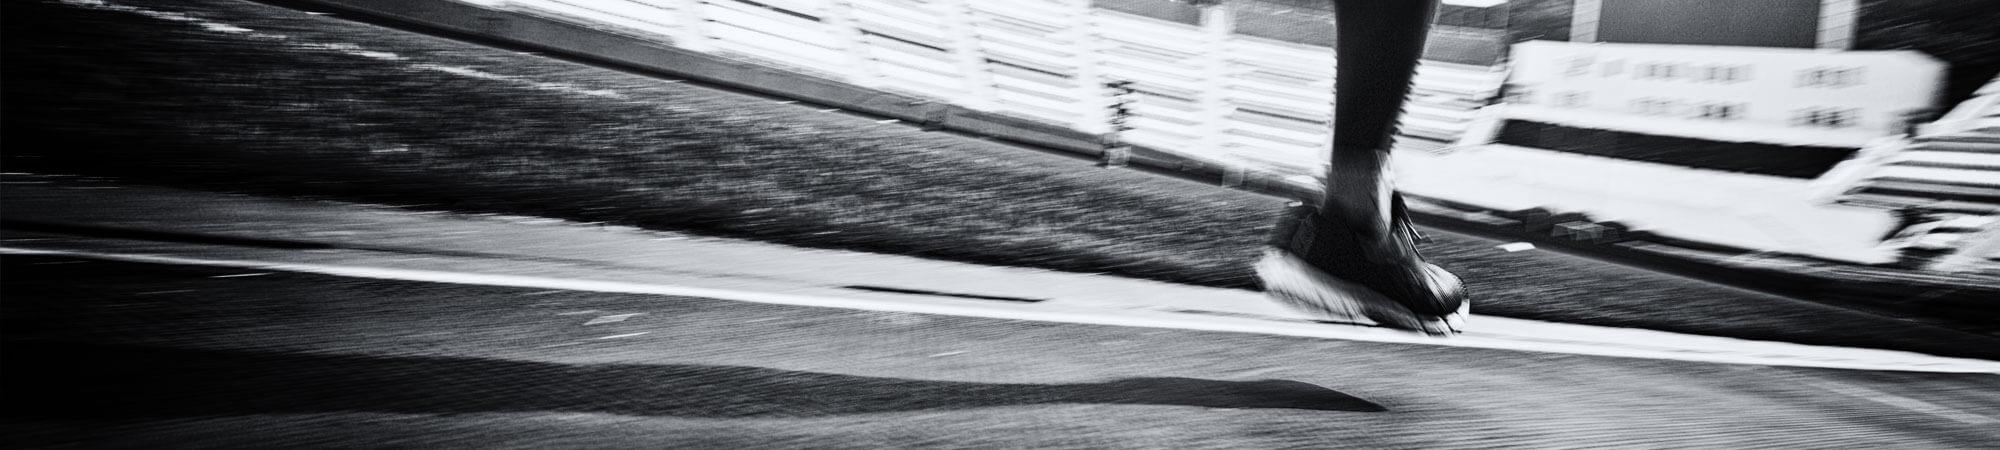 ECIU Student Team running at the Batavieren Relay Race